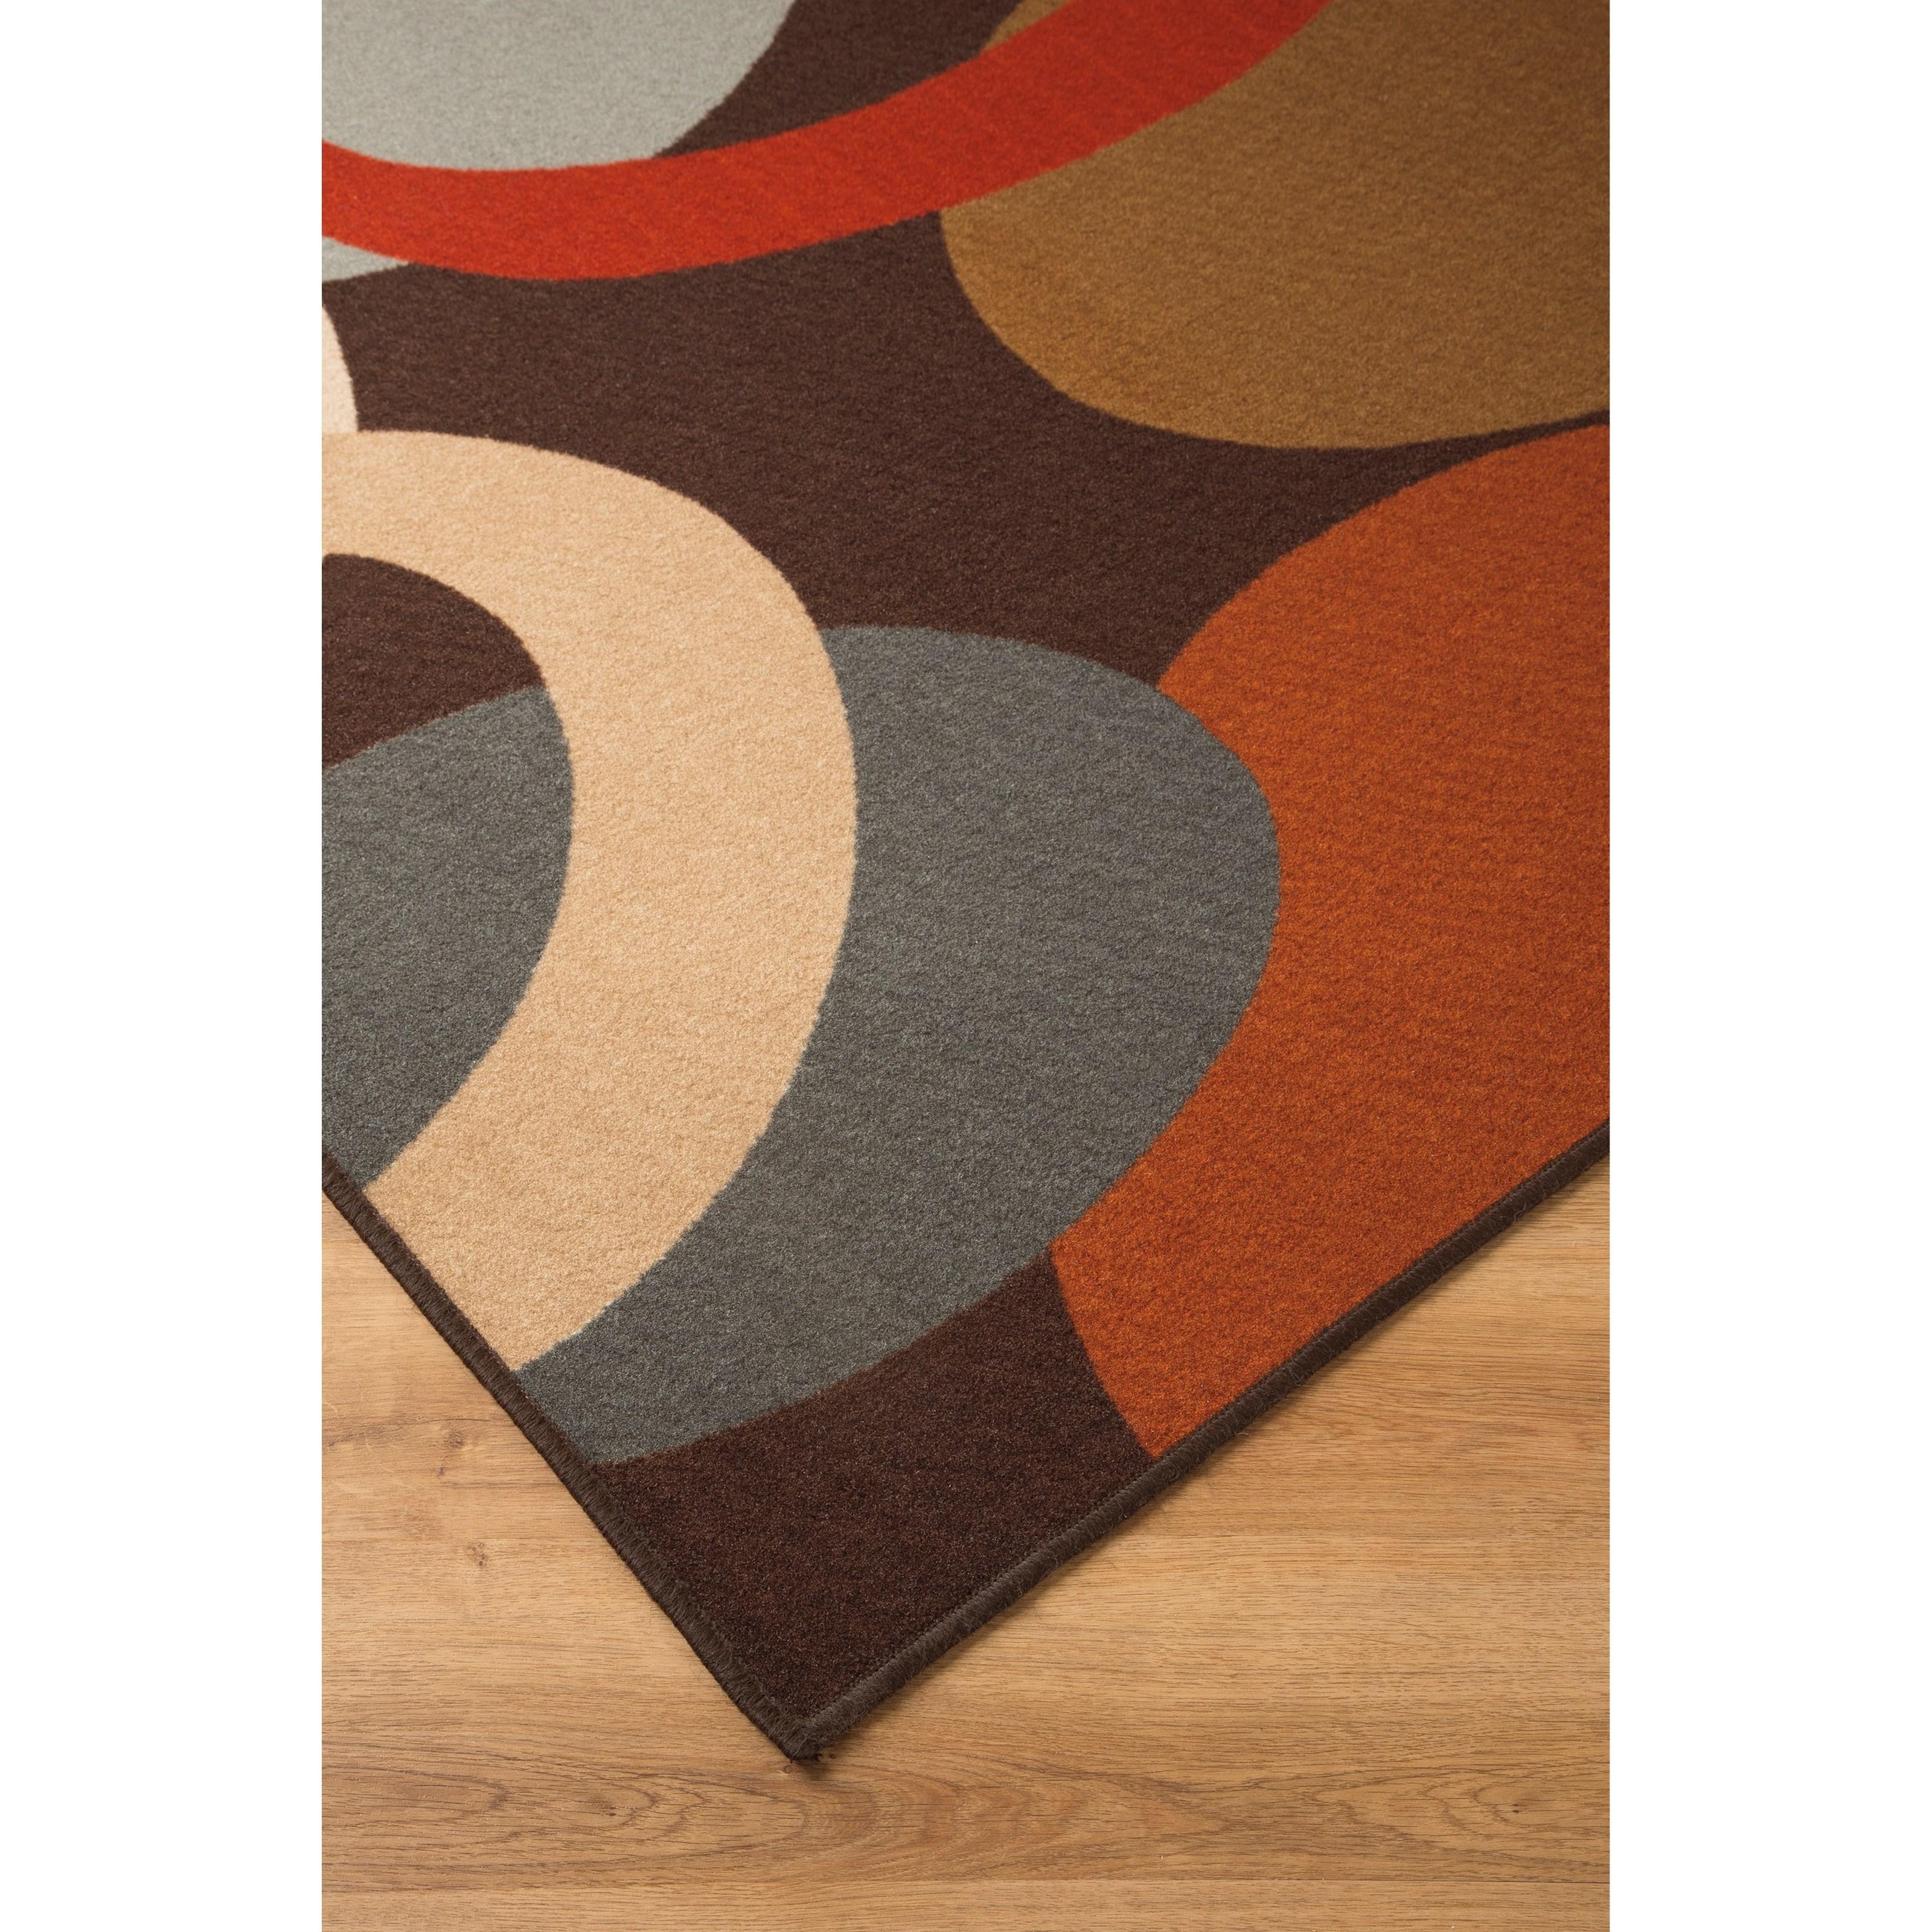 Signature Design By Ashley Contemporary Area Rugs R335002 Acciai Brown Blue Medium Rug Becker